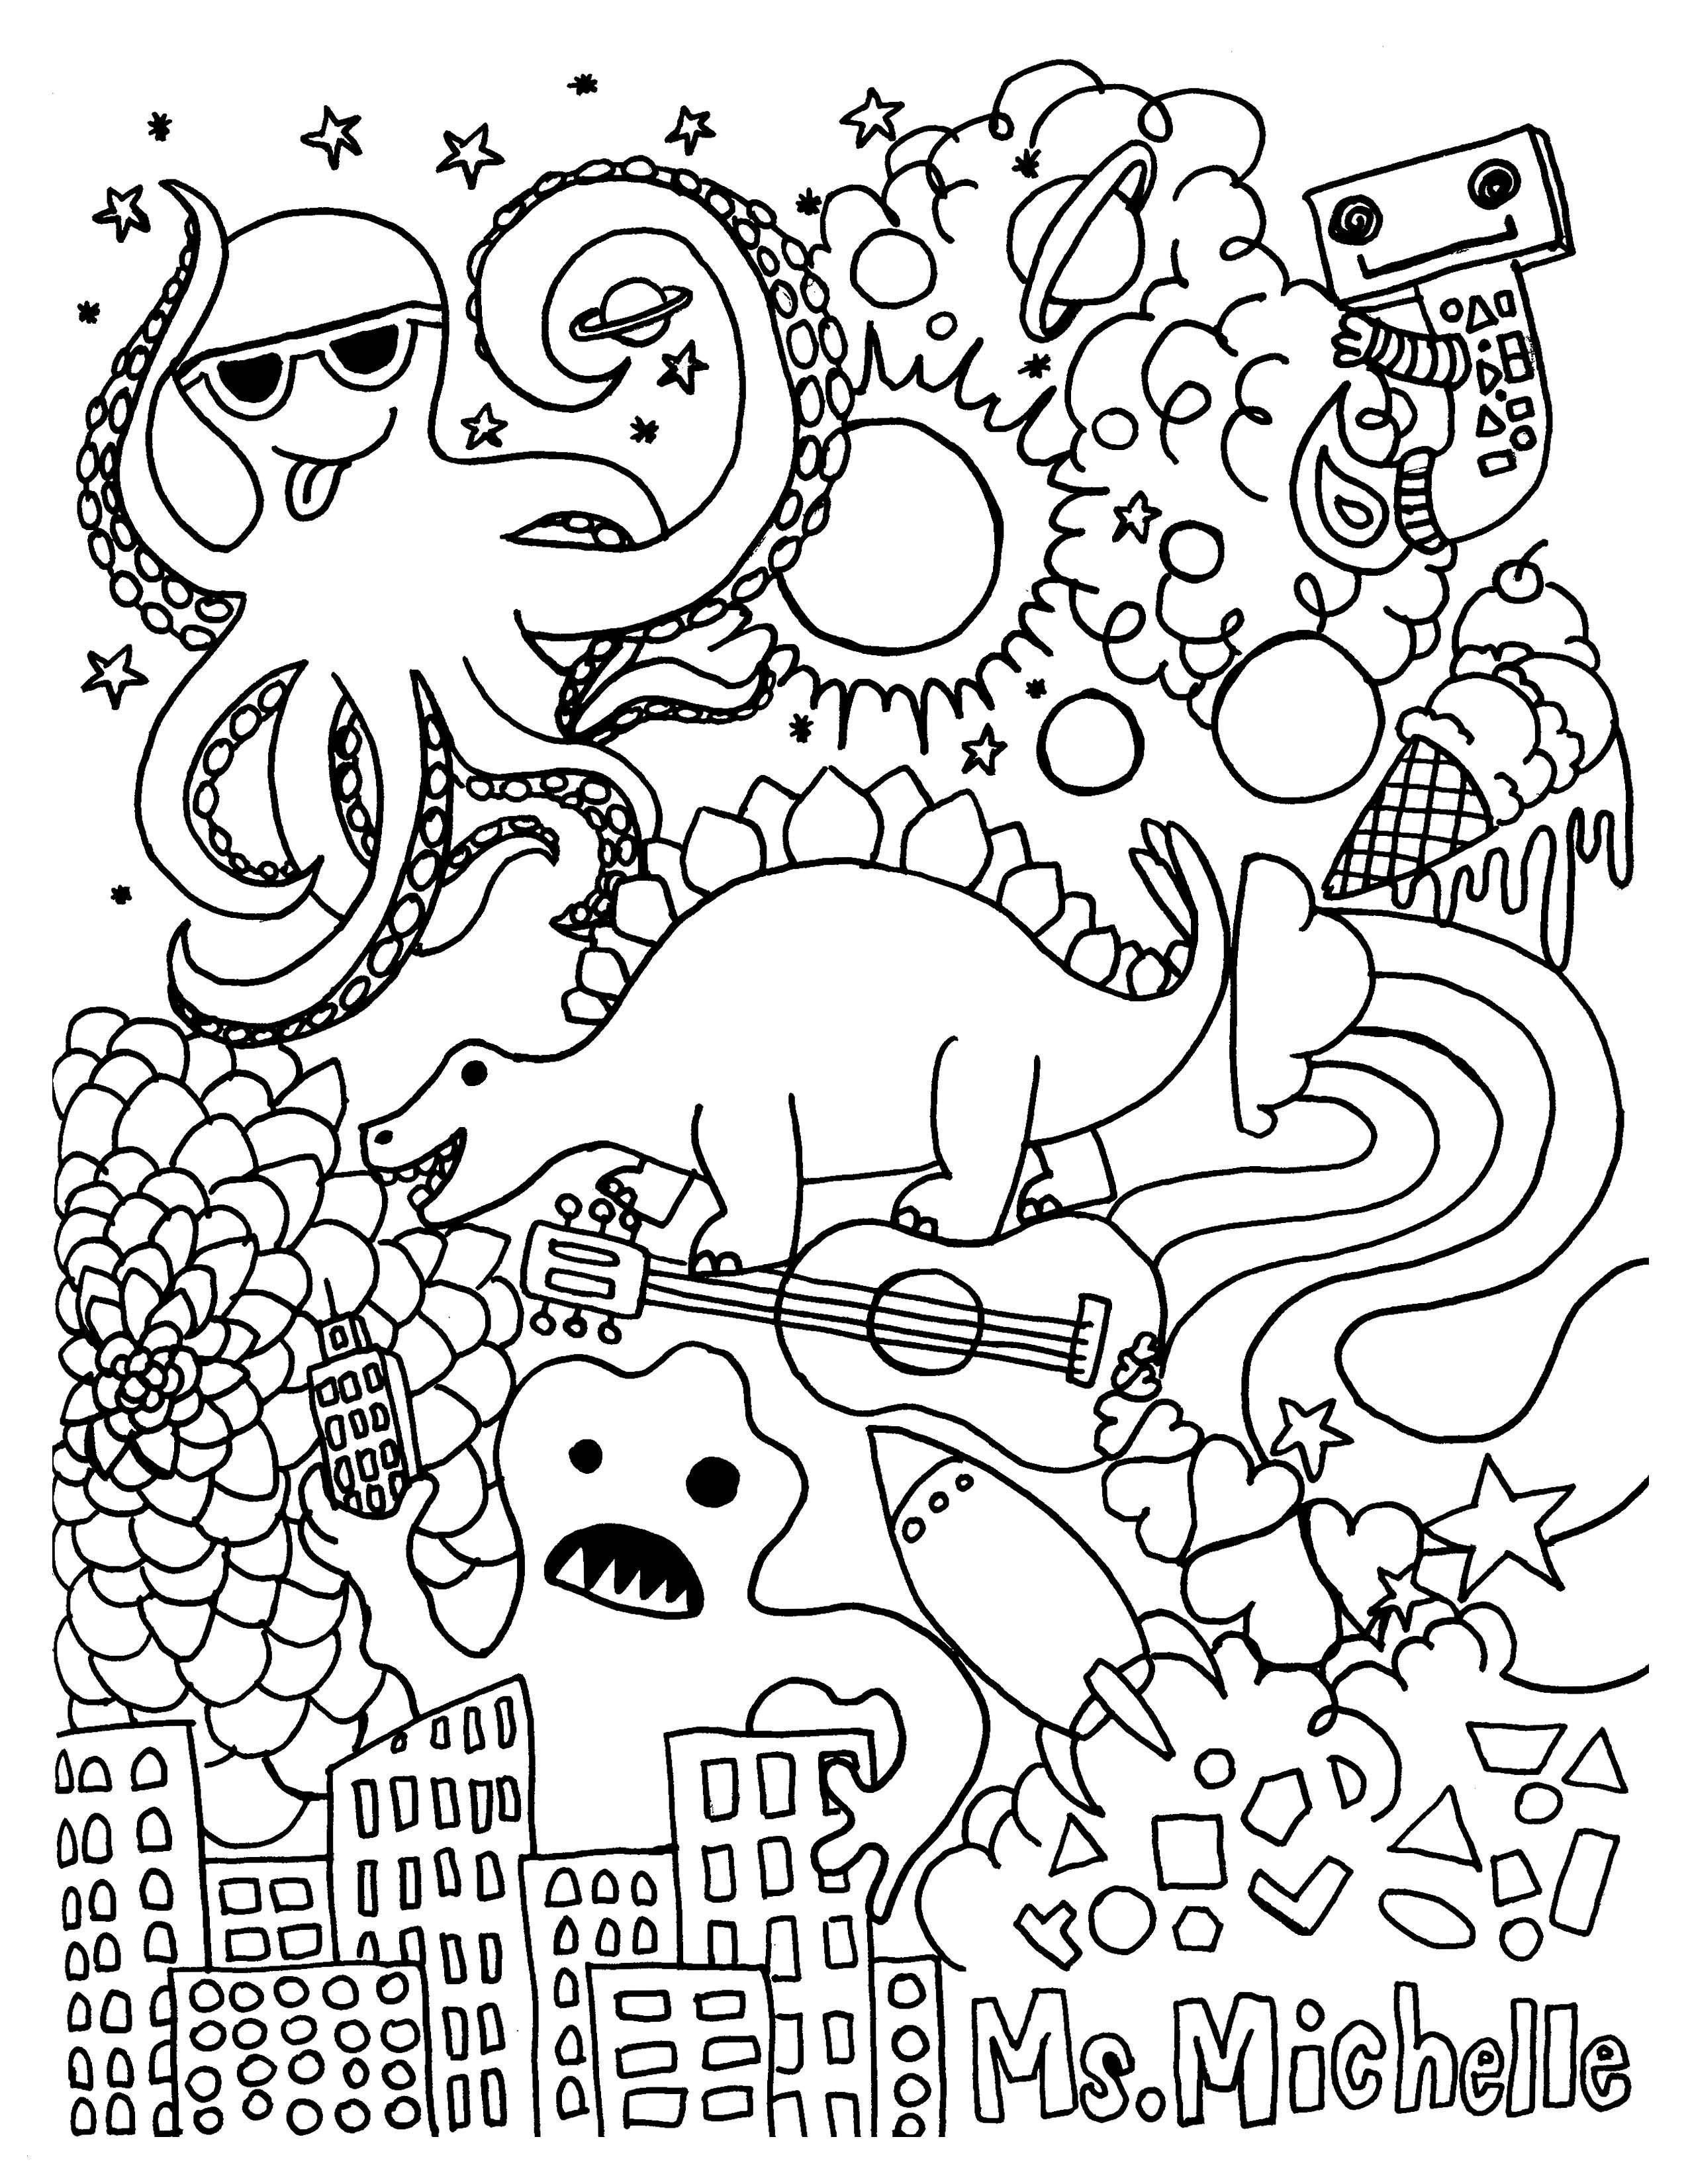 Bilder Zum Ausmalen Minions Genial Minion Coloring Pages Beautiful Coloring Books for Kids Coloring Das Bild